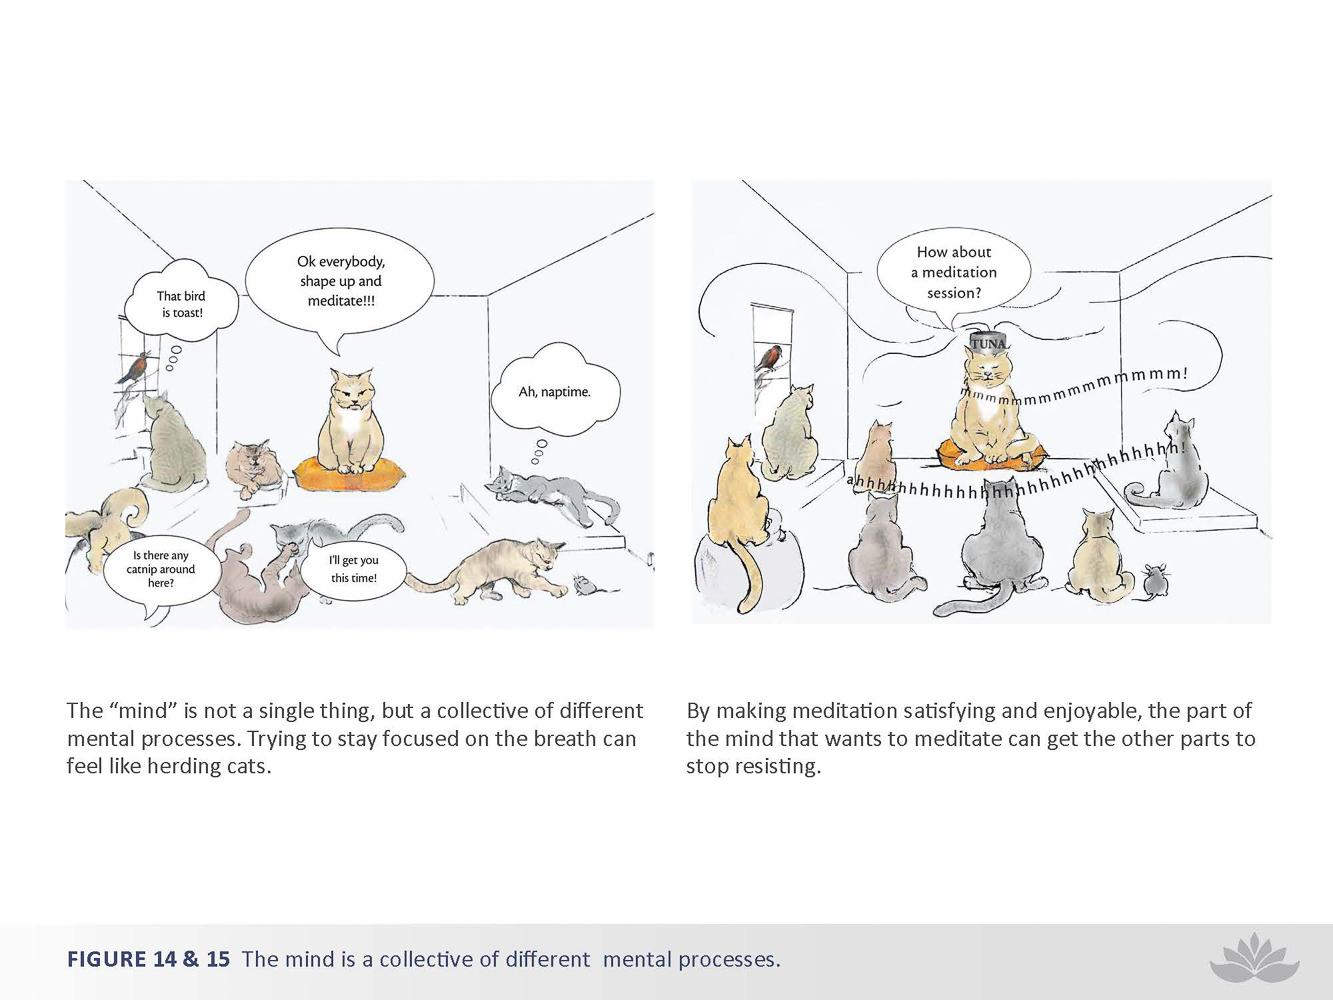 nwd-illustration-19-2.jpg